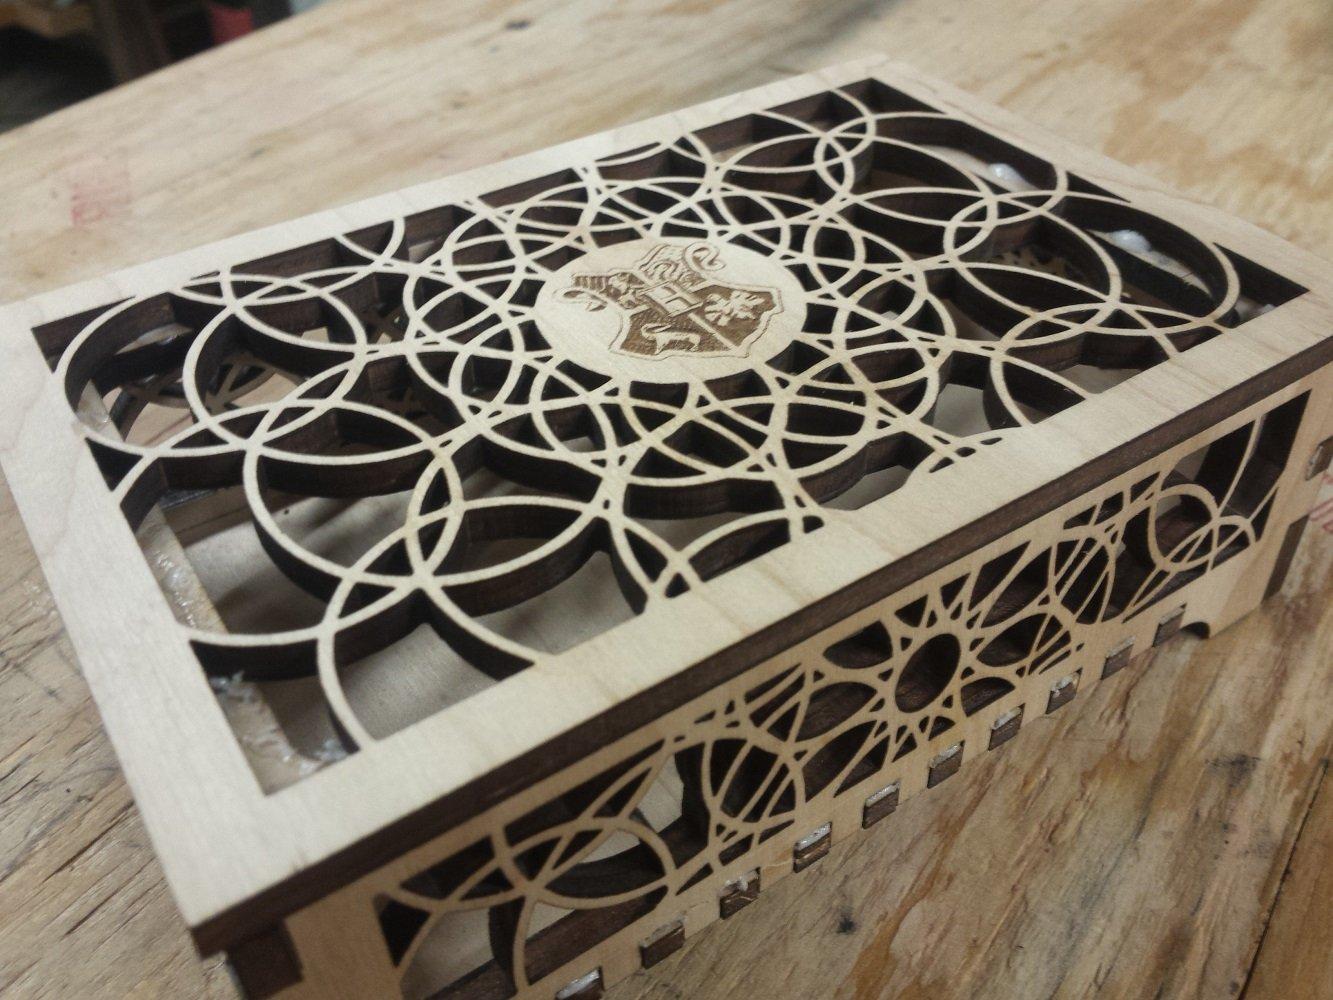 Harry Potter Wooden Box   Harry Potter Jewelry Box/Desk Chest   Harry Potter Gift